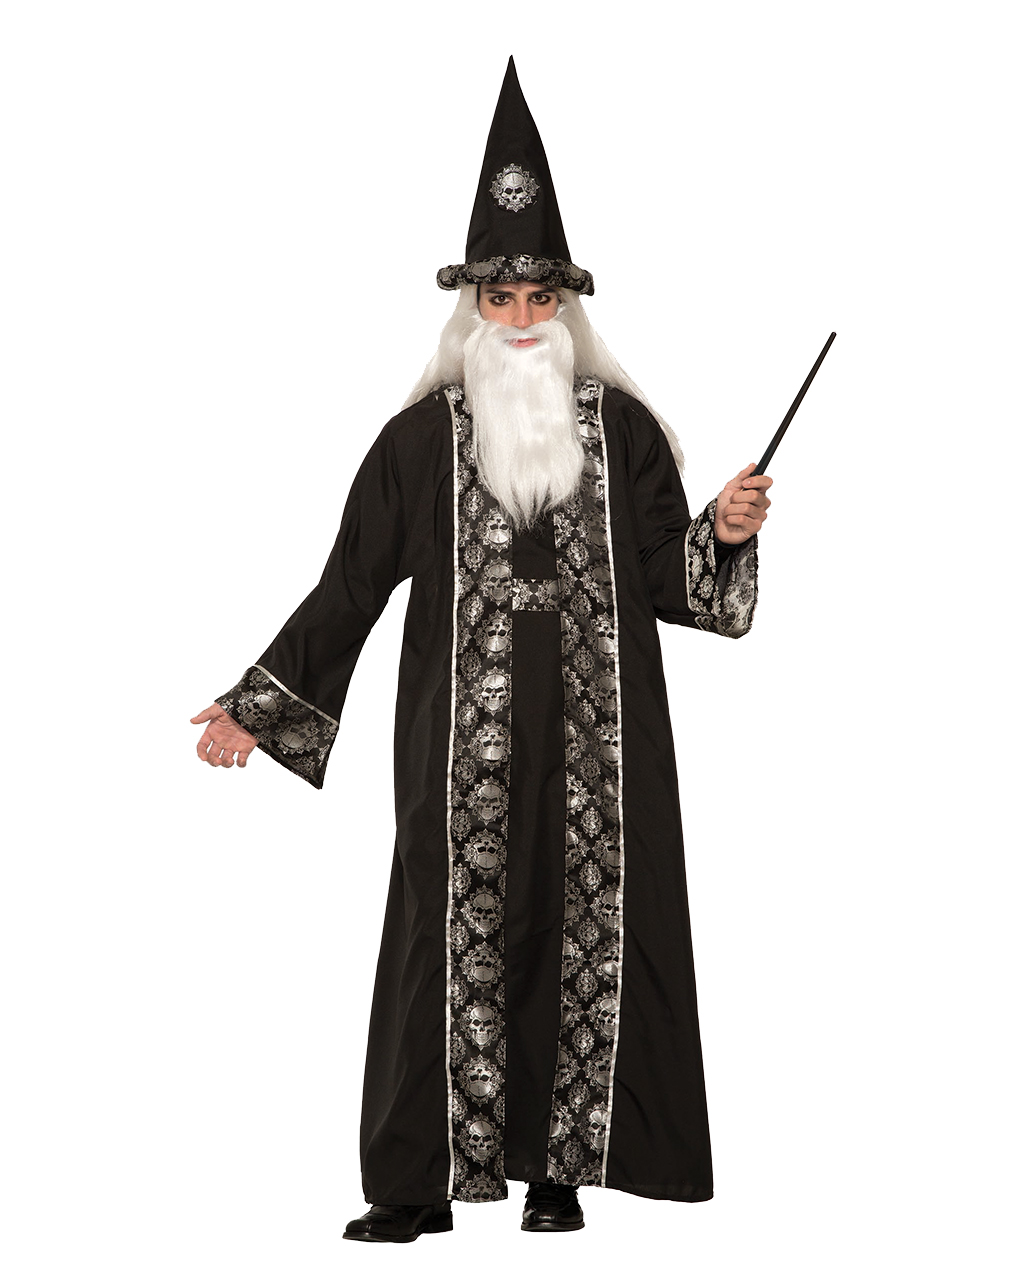 Adult Modern Day Wizard Costume Mens Halloween Warlock Fancy Dress Outfit